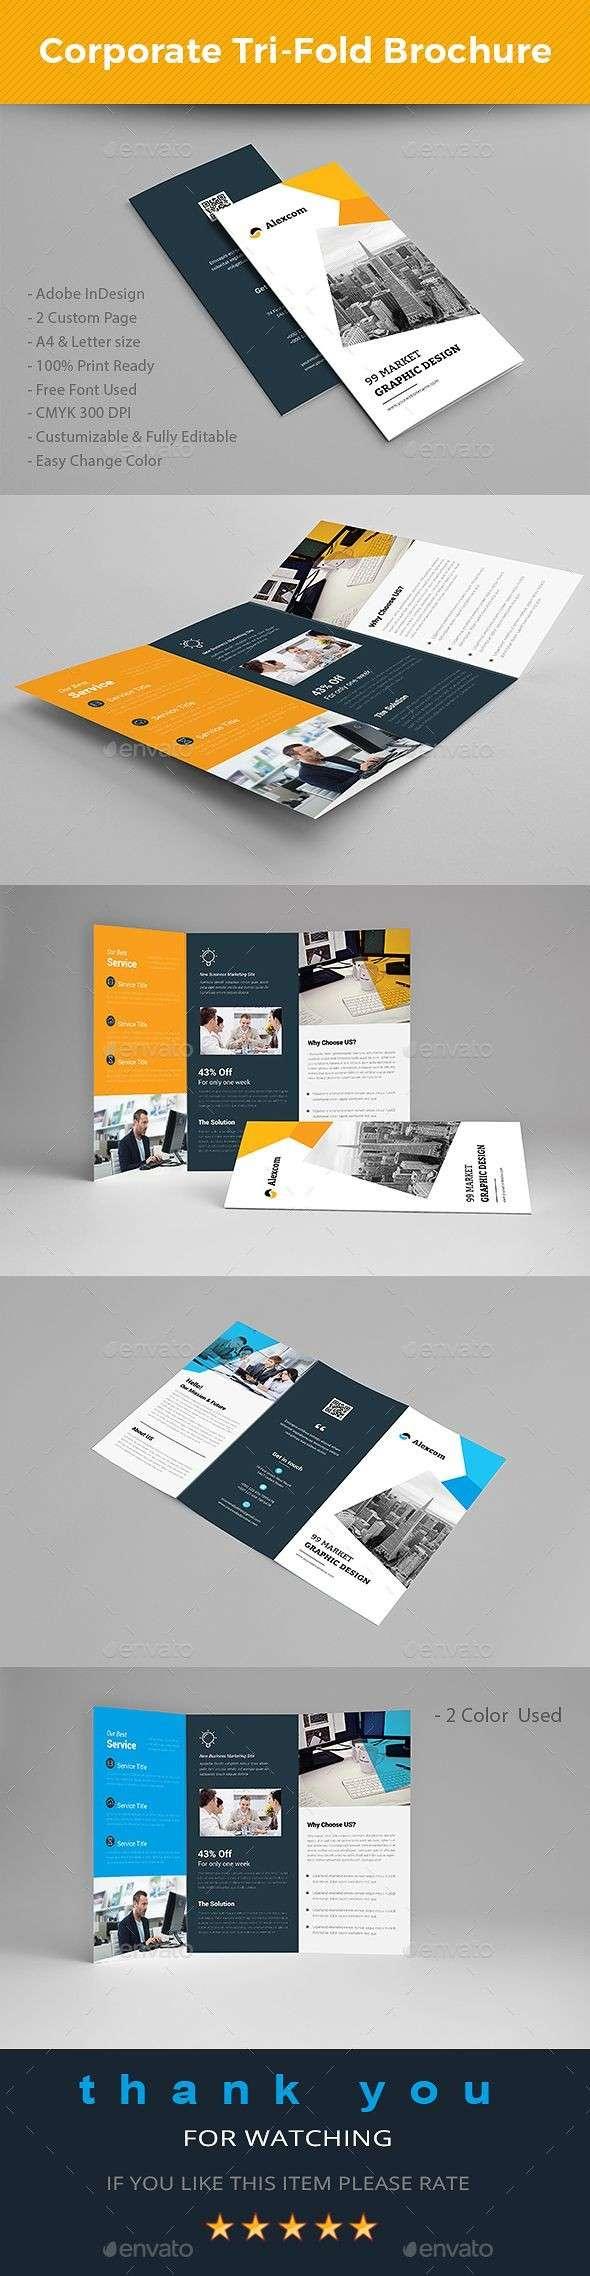 Tri Fold Letter Template - 21 Move Free Line Tri Fold Brochure Template Sketch Dvjixyt